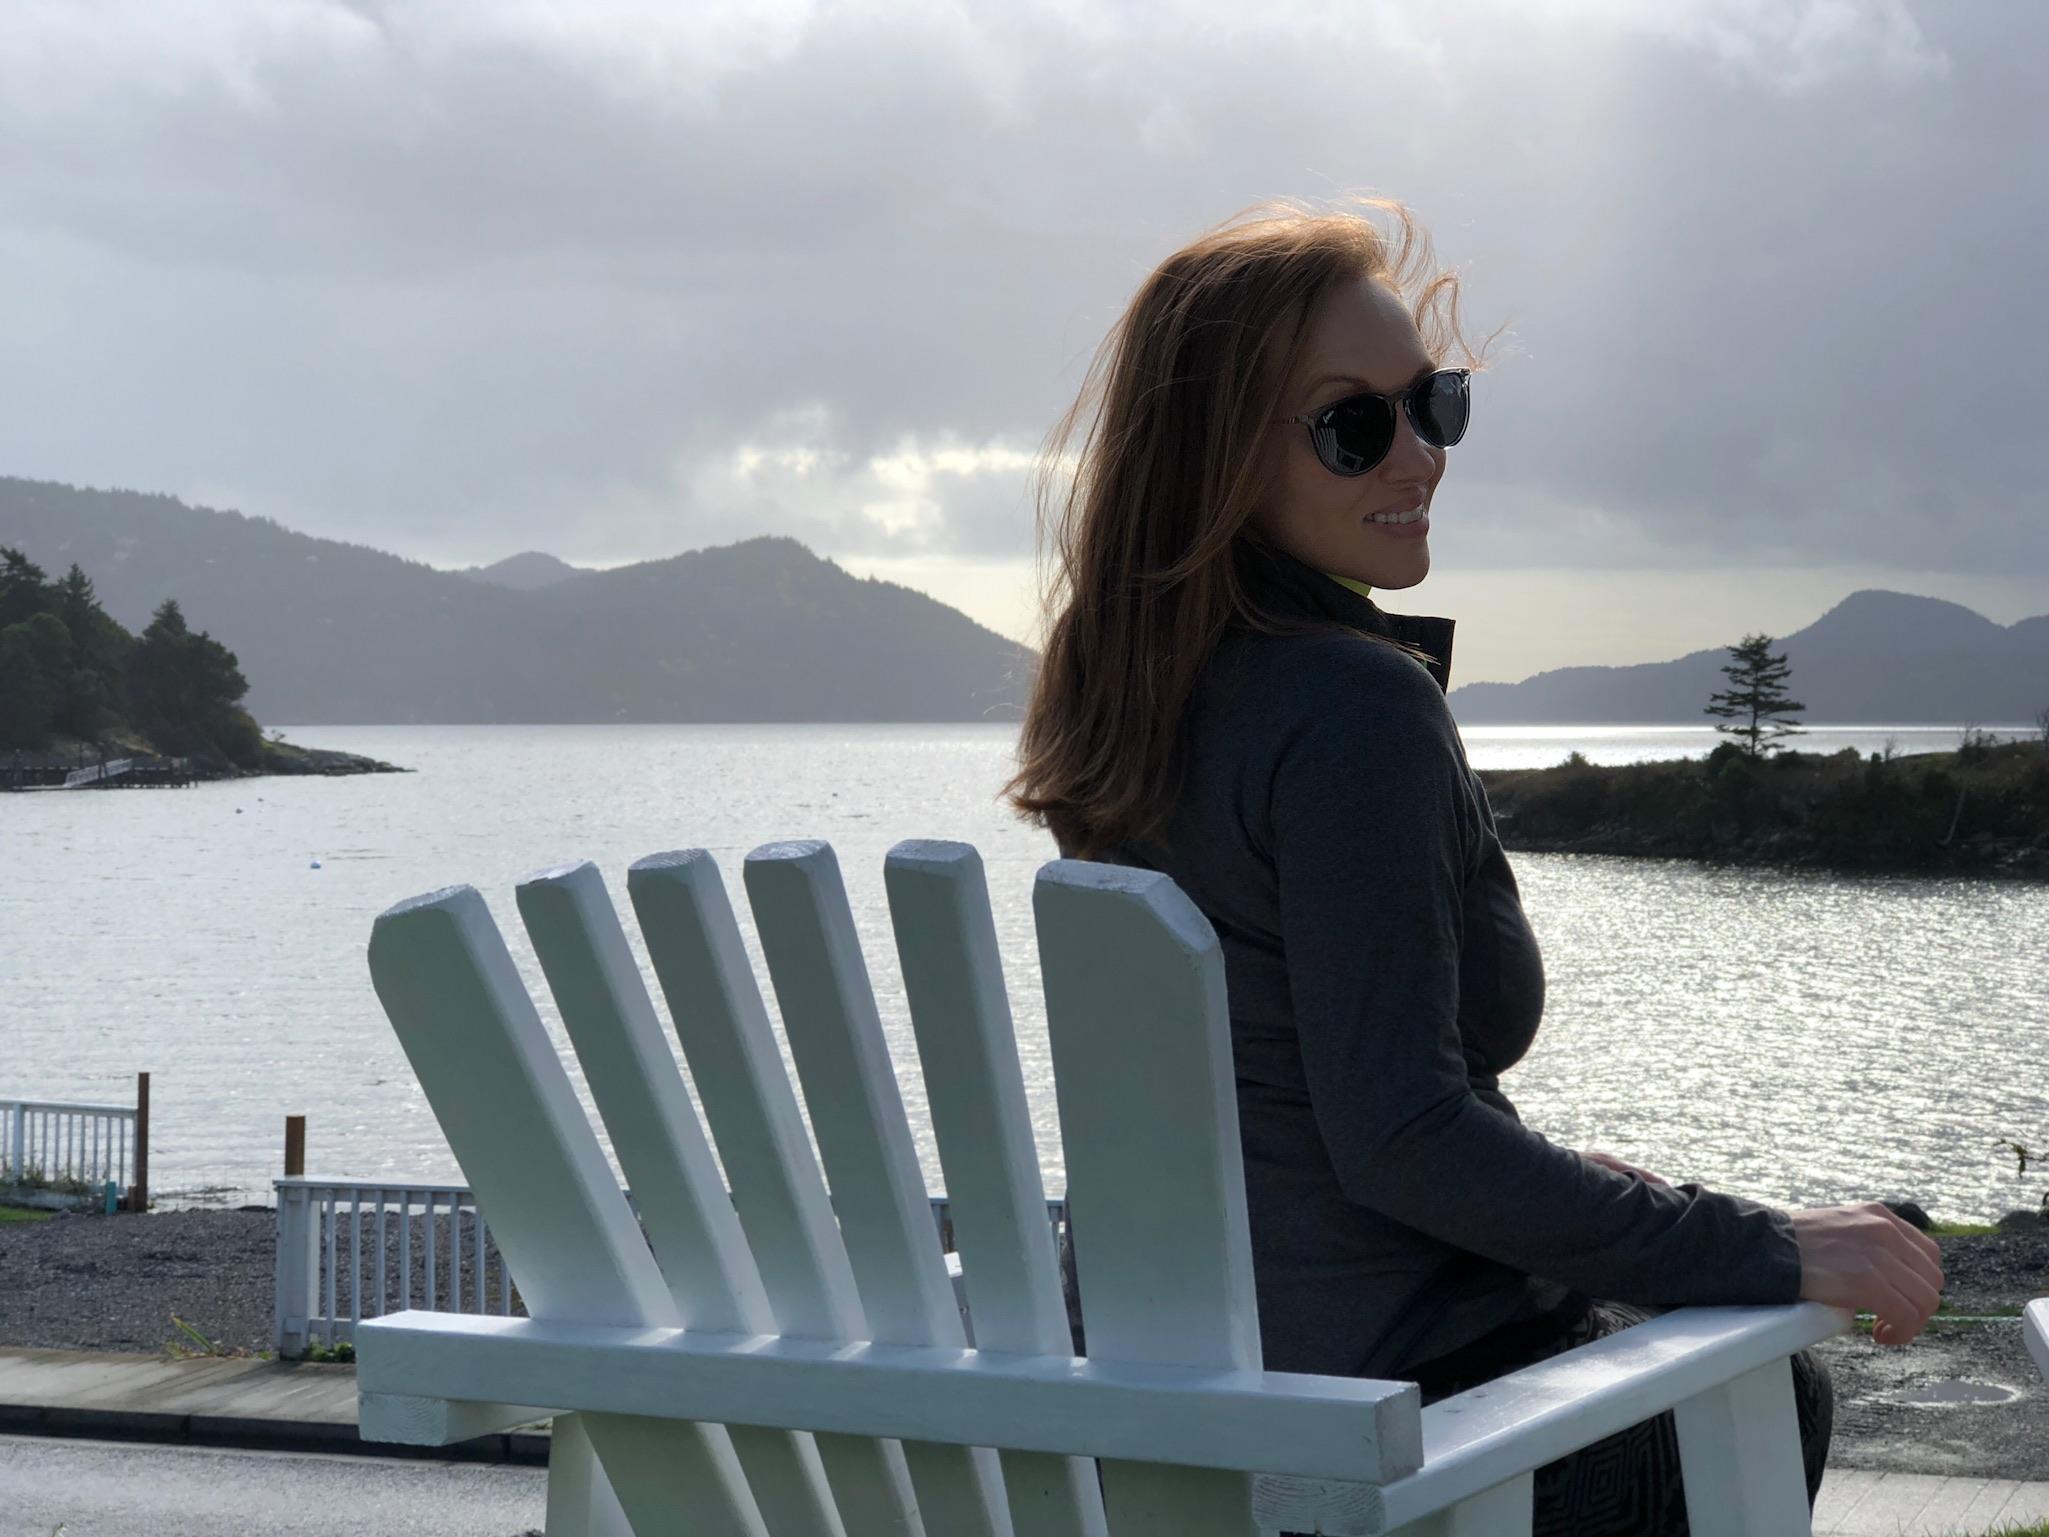 Outlook Inn - Orcas Island, Washington, USA